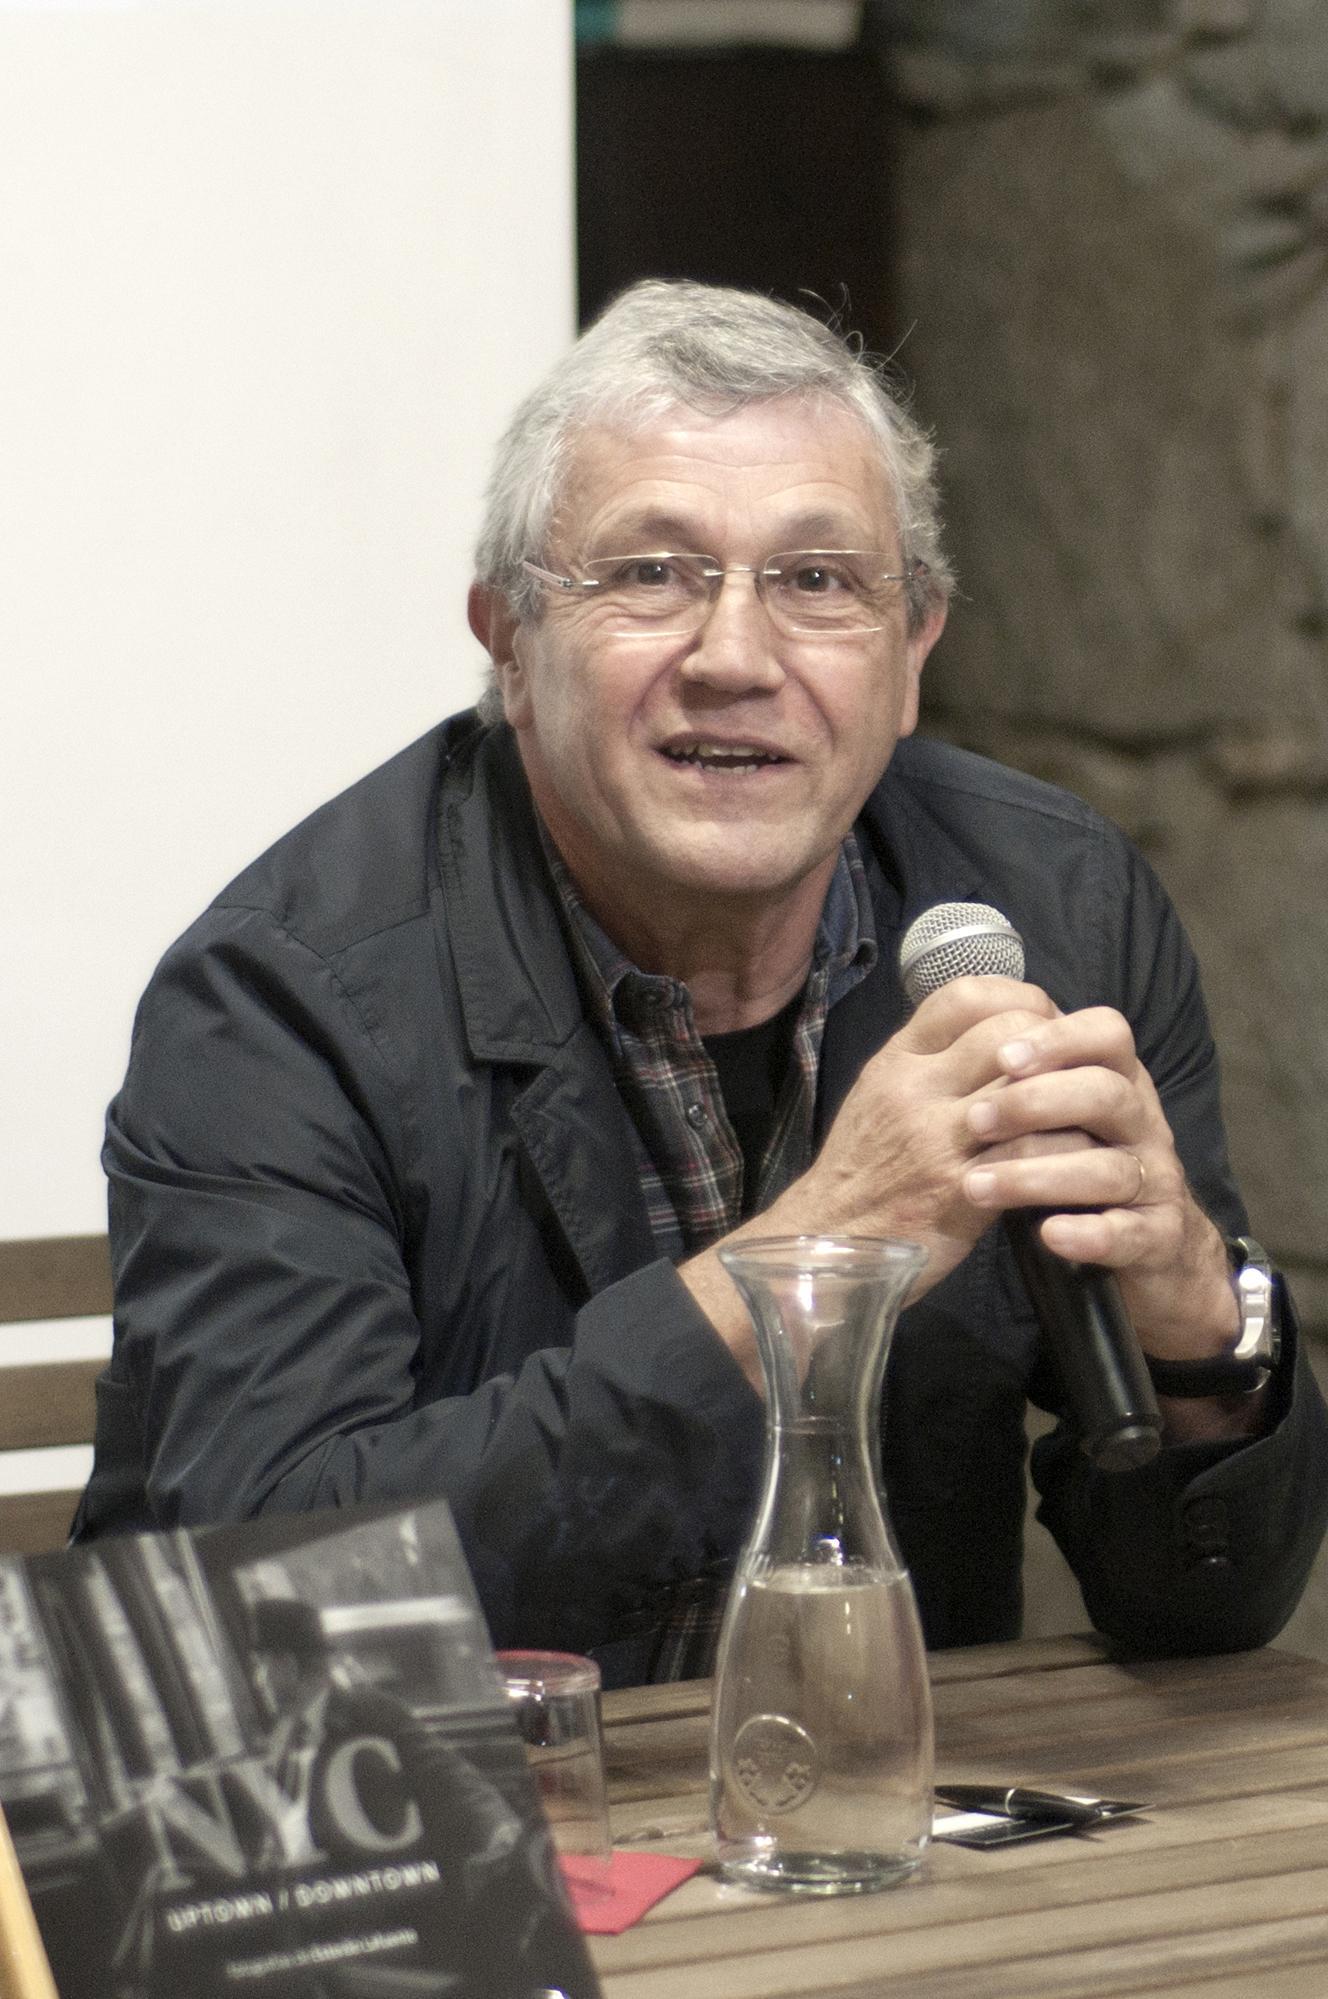 Estevão Lafuente